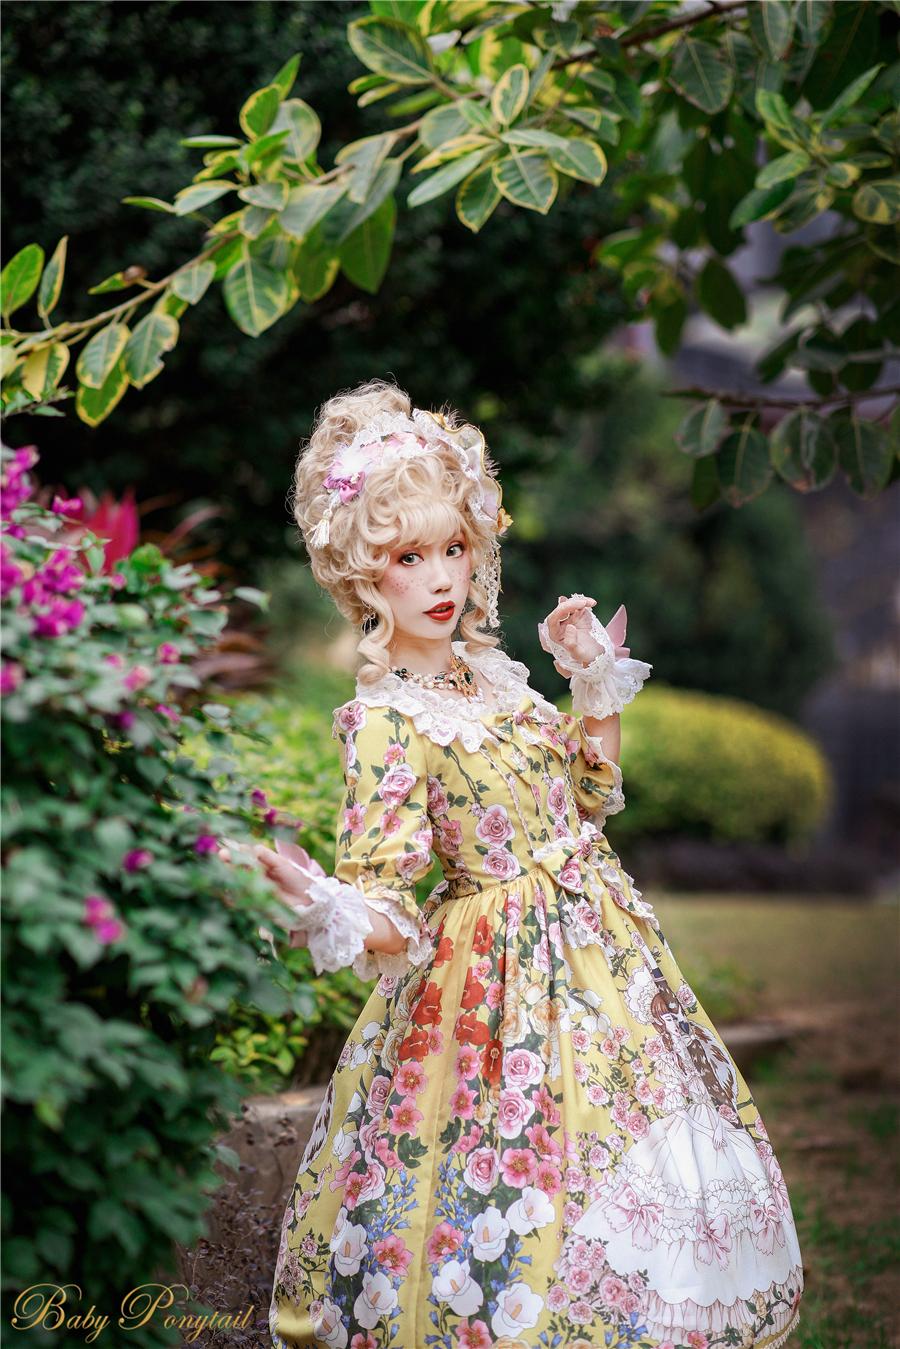 Baby Ponytail_Model Photo_Polly's Garden of Dreams_OP Yellow_Kaka_09.jpg